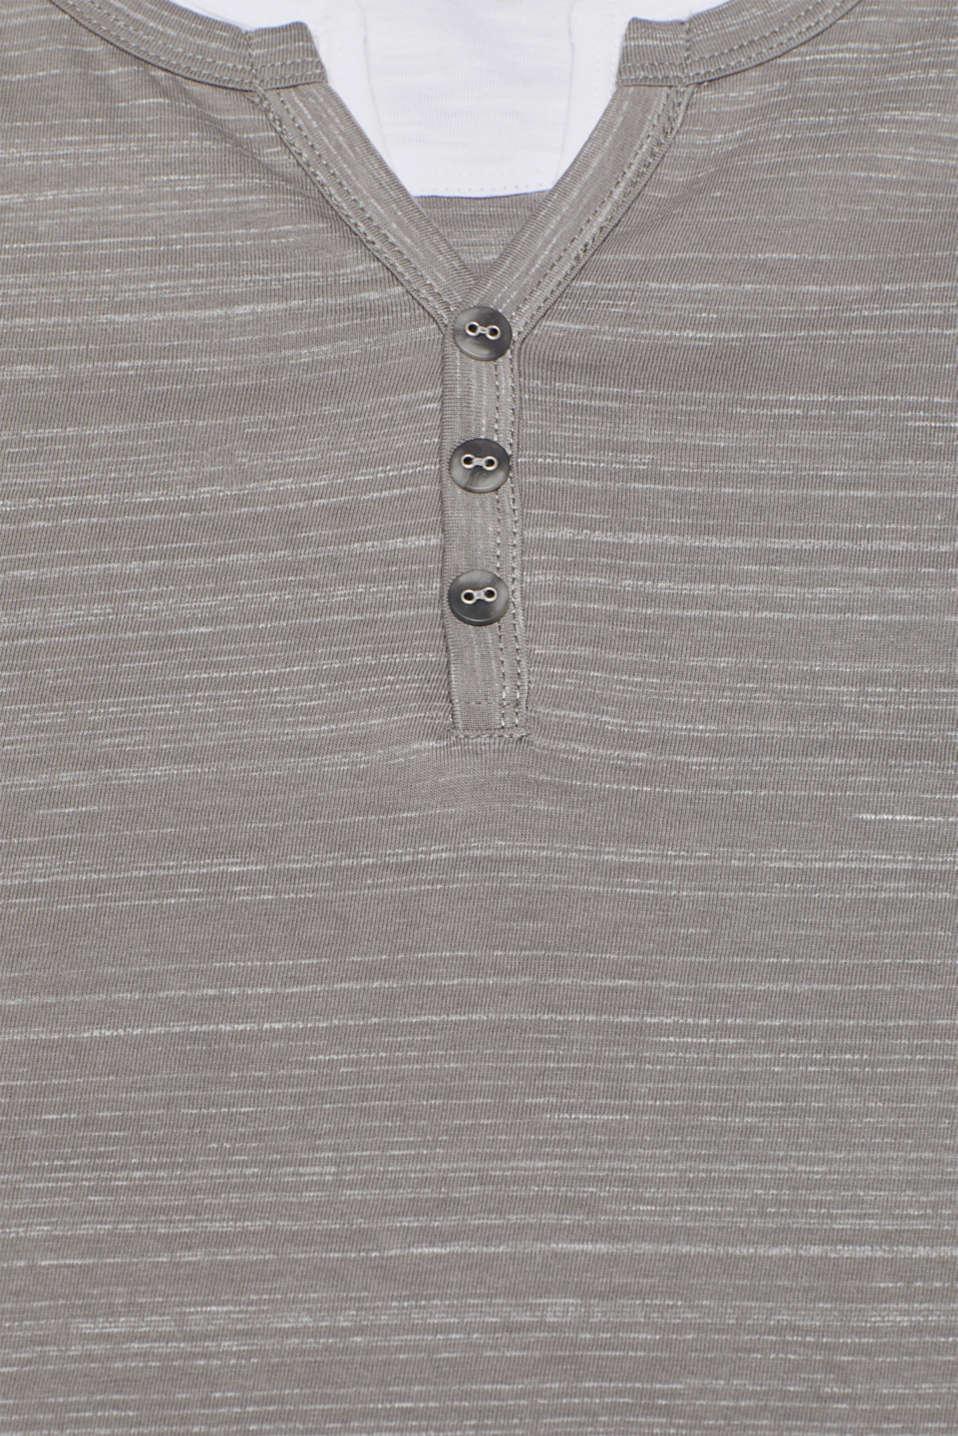 T-Shirts Slim fit, GREY, detail image number 4